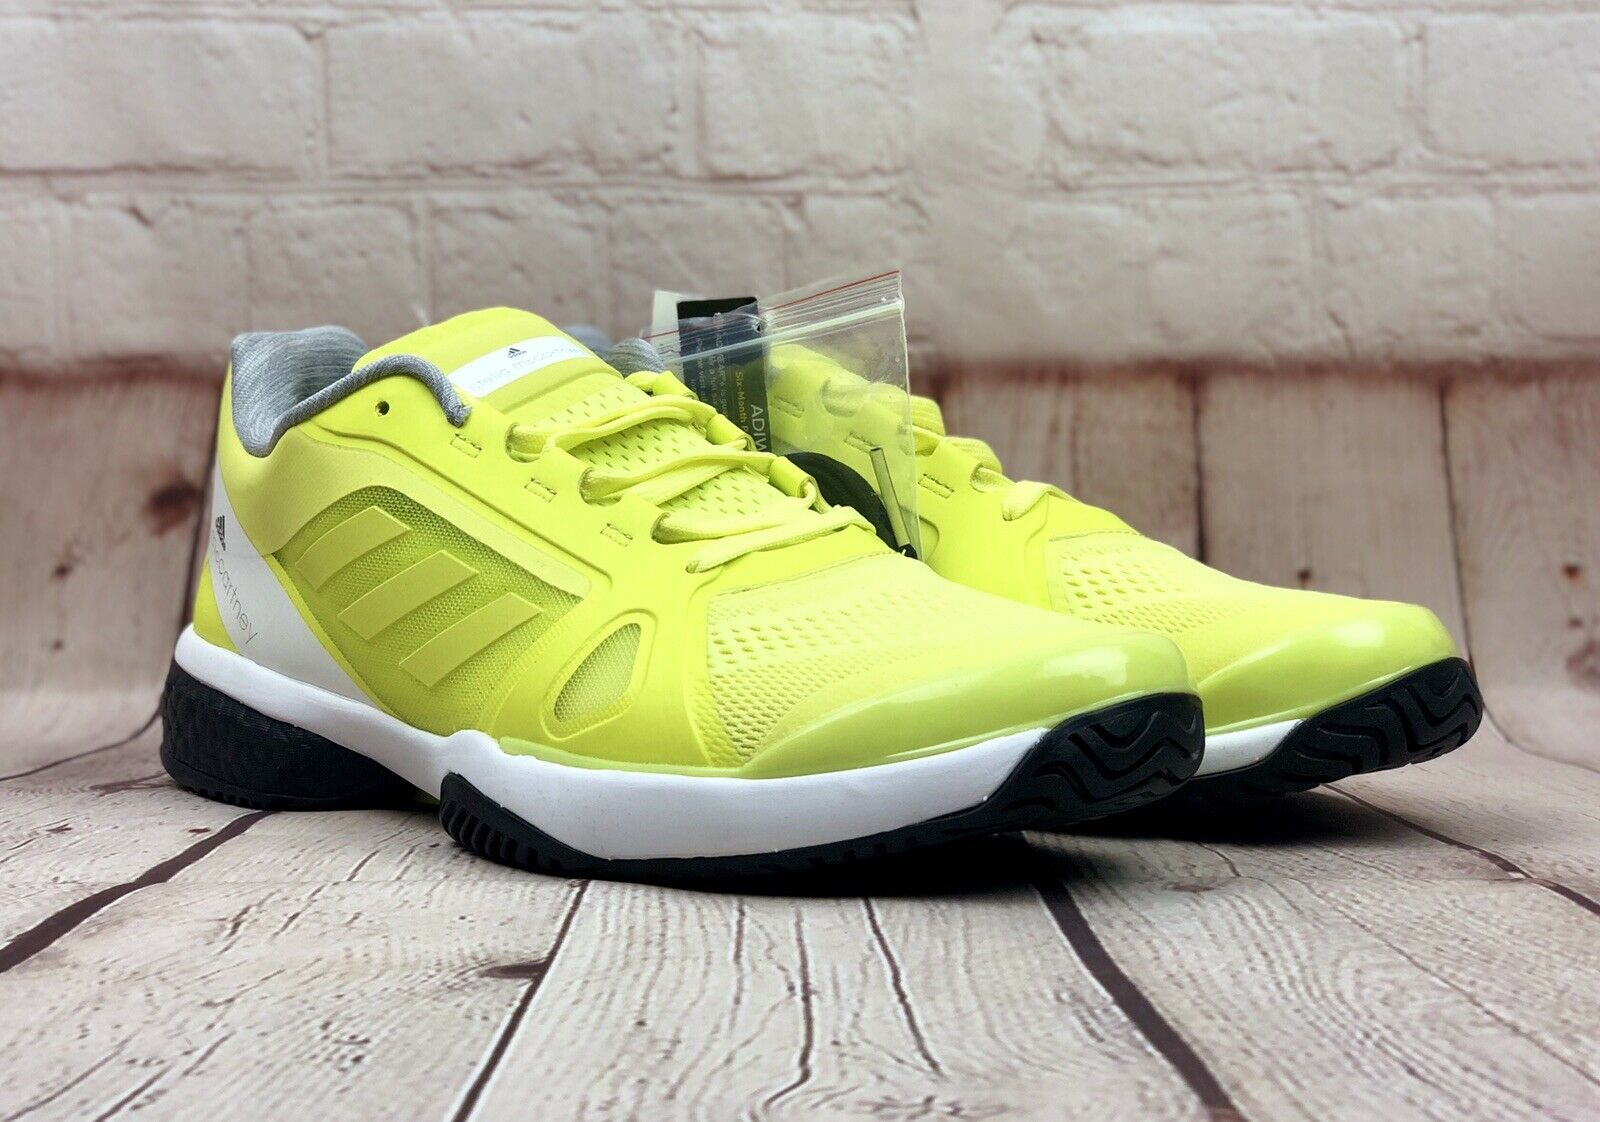 NEW Adidas Womens Size 11.5 Stella McCartney Barricade Boost Tennis shoes CM7804